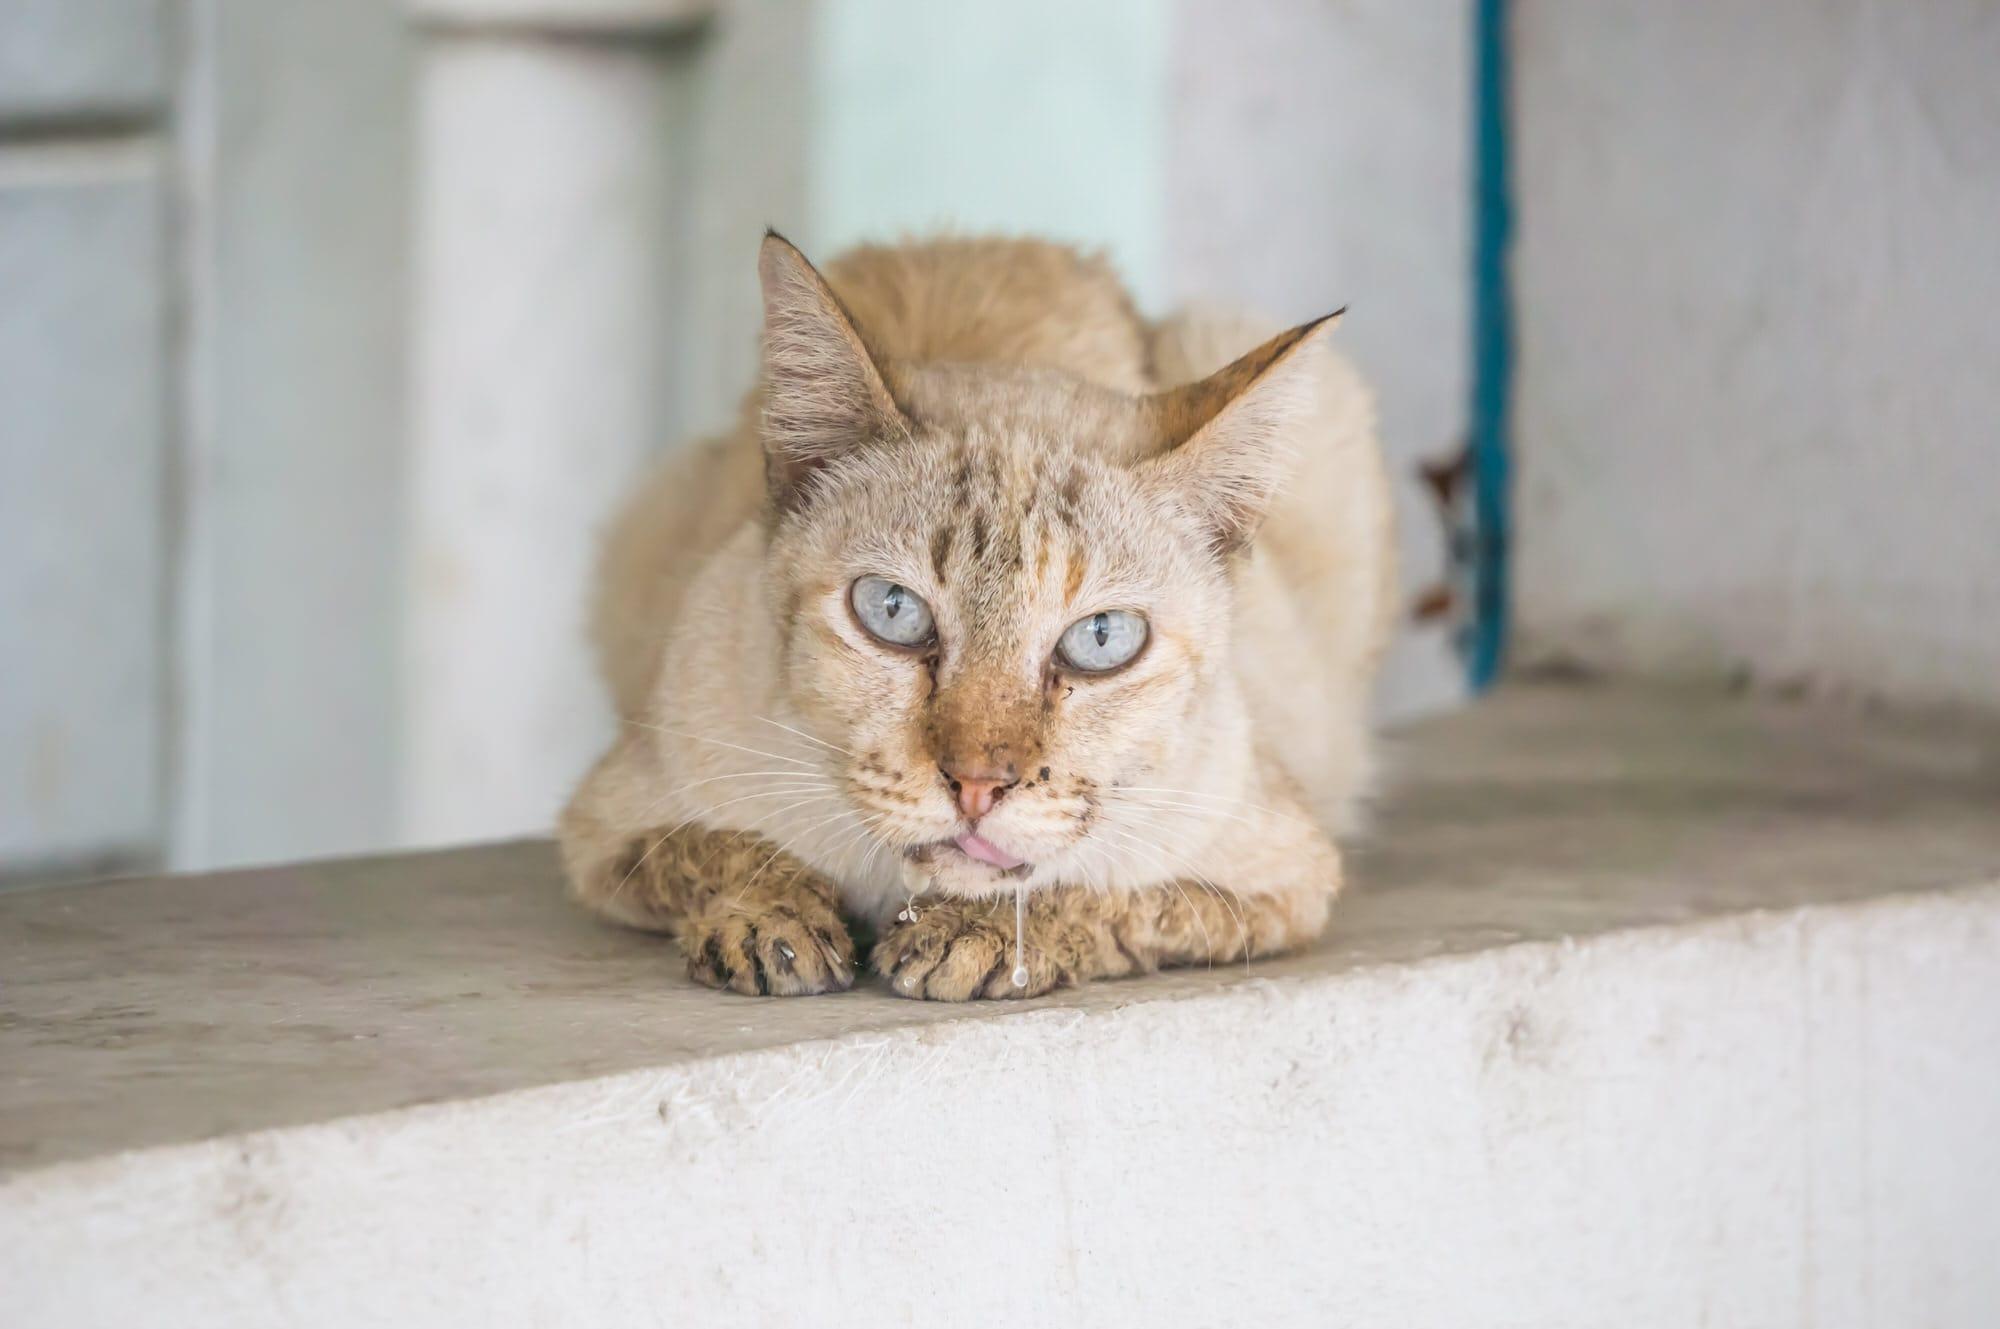 Katze sabbert